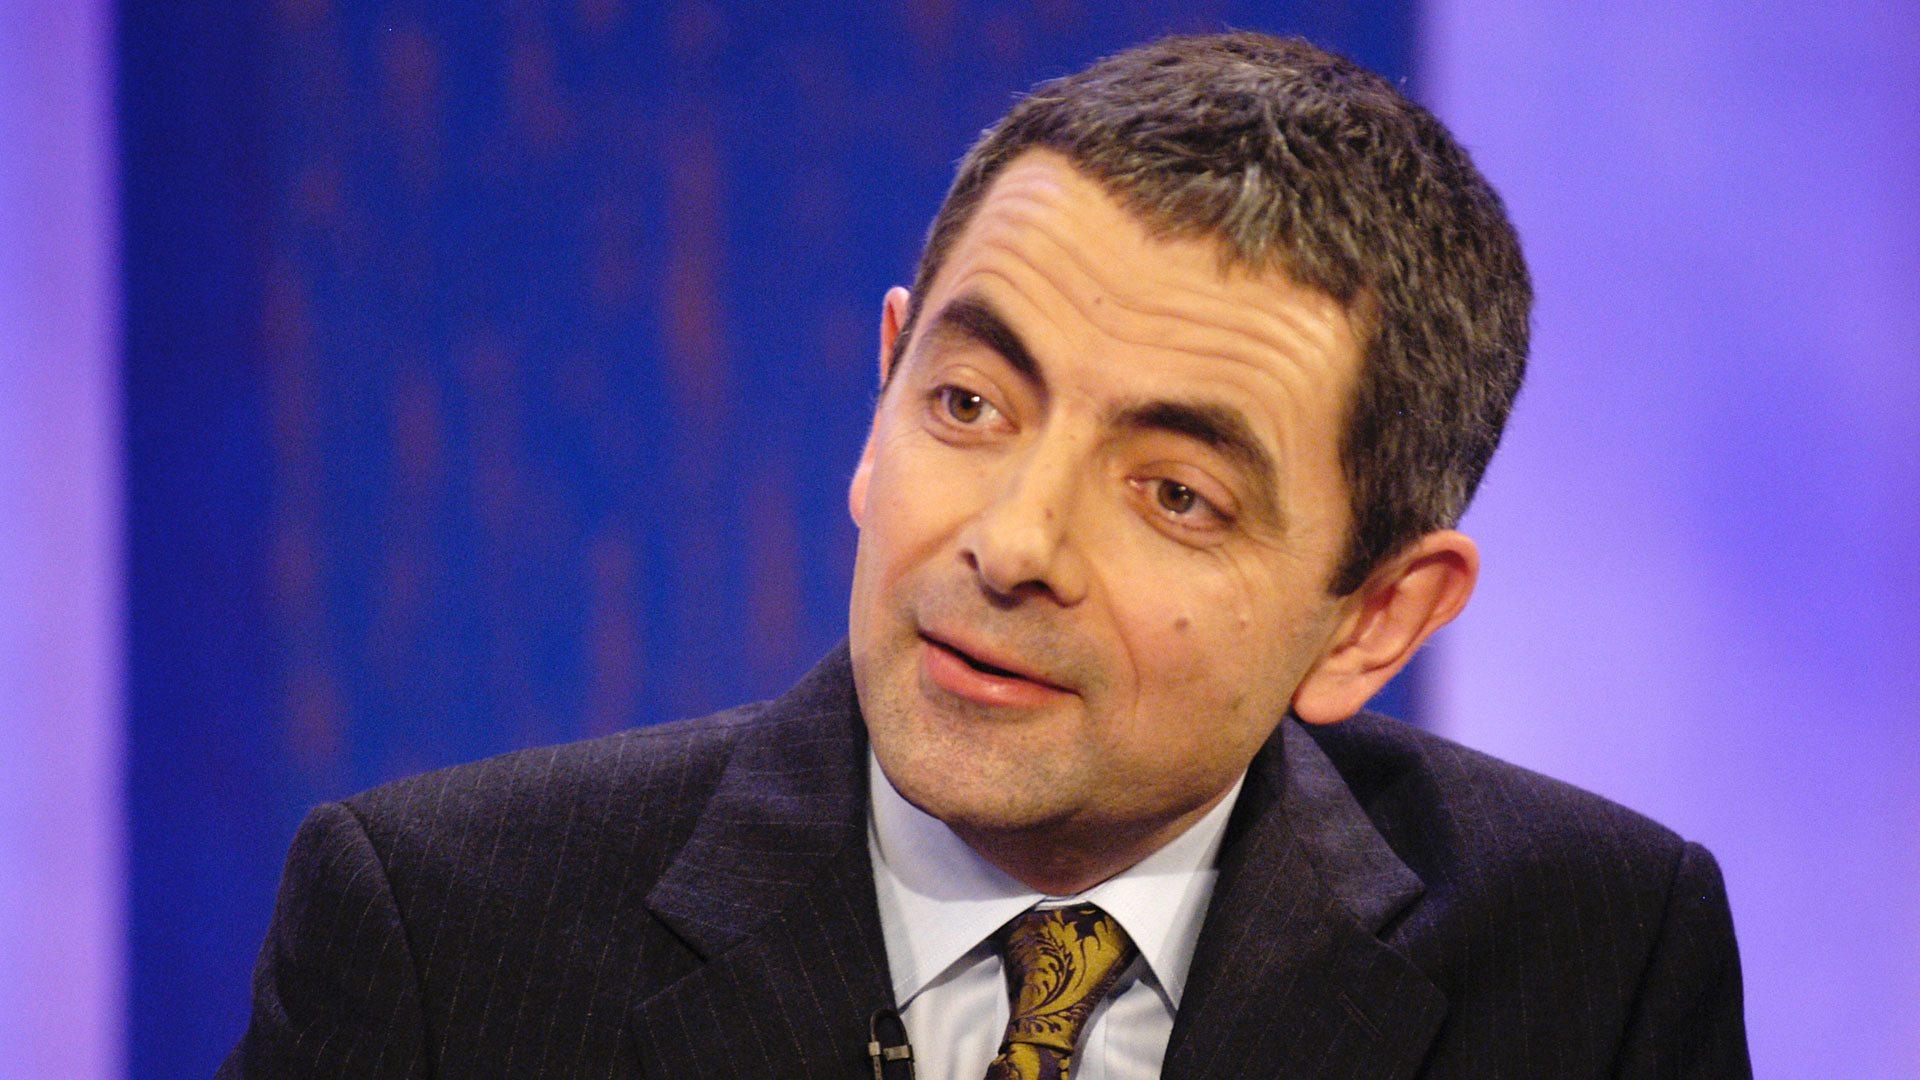 Bbc Radio 4 God S Work Episode 1 Sheer Bean Ius Nine Reasons We Love Rowan Atkinson